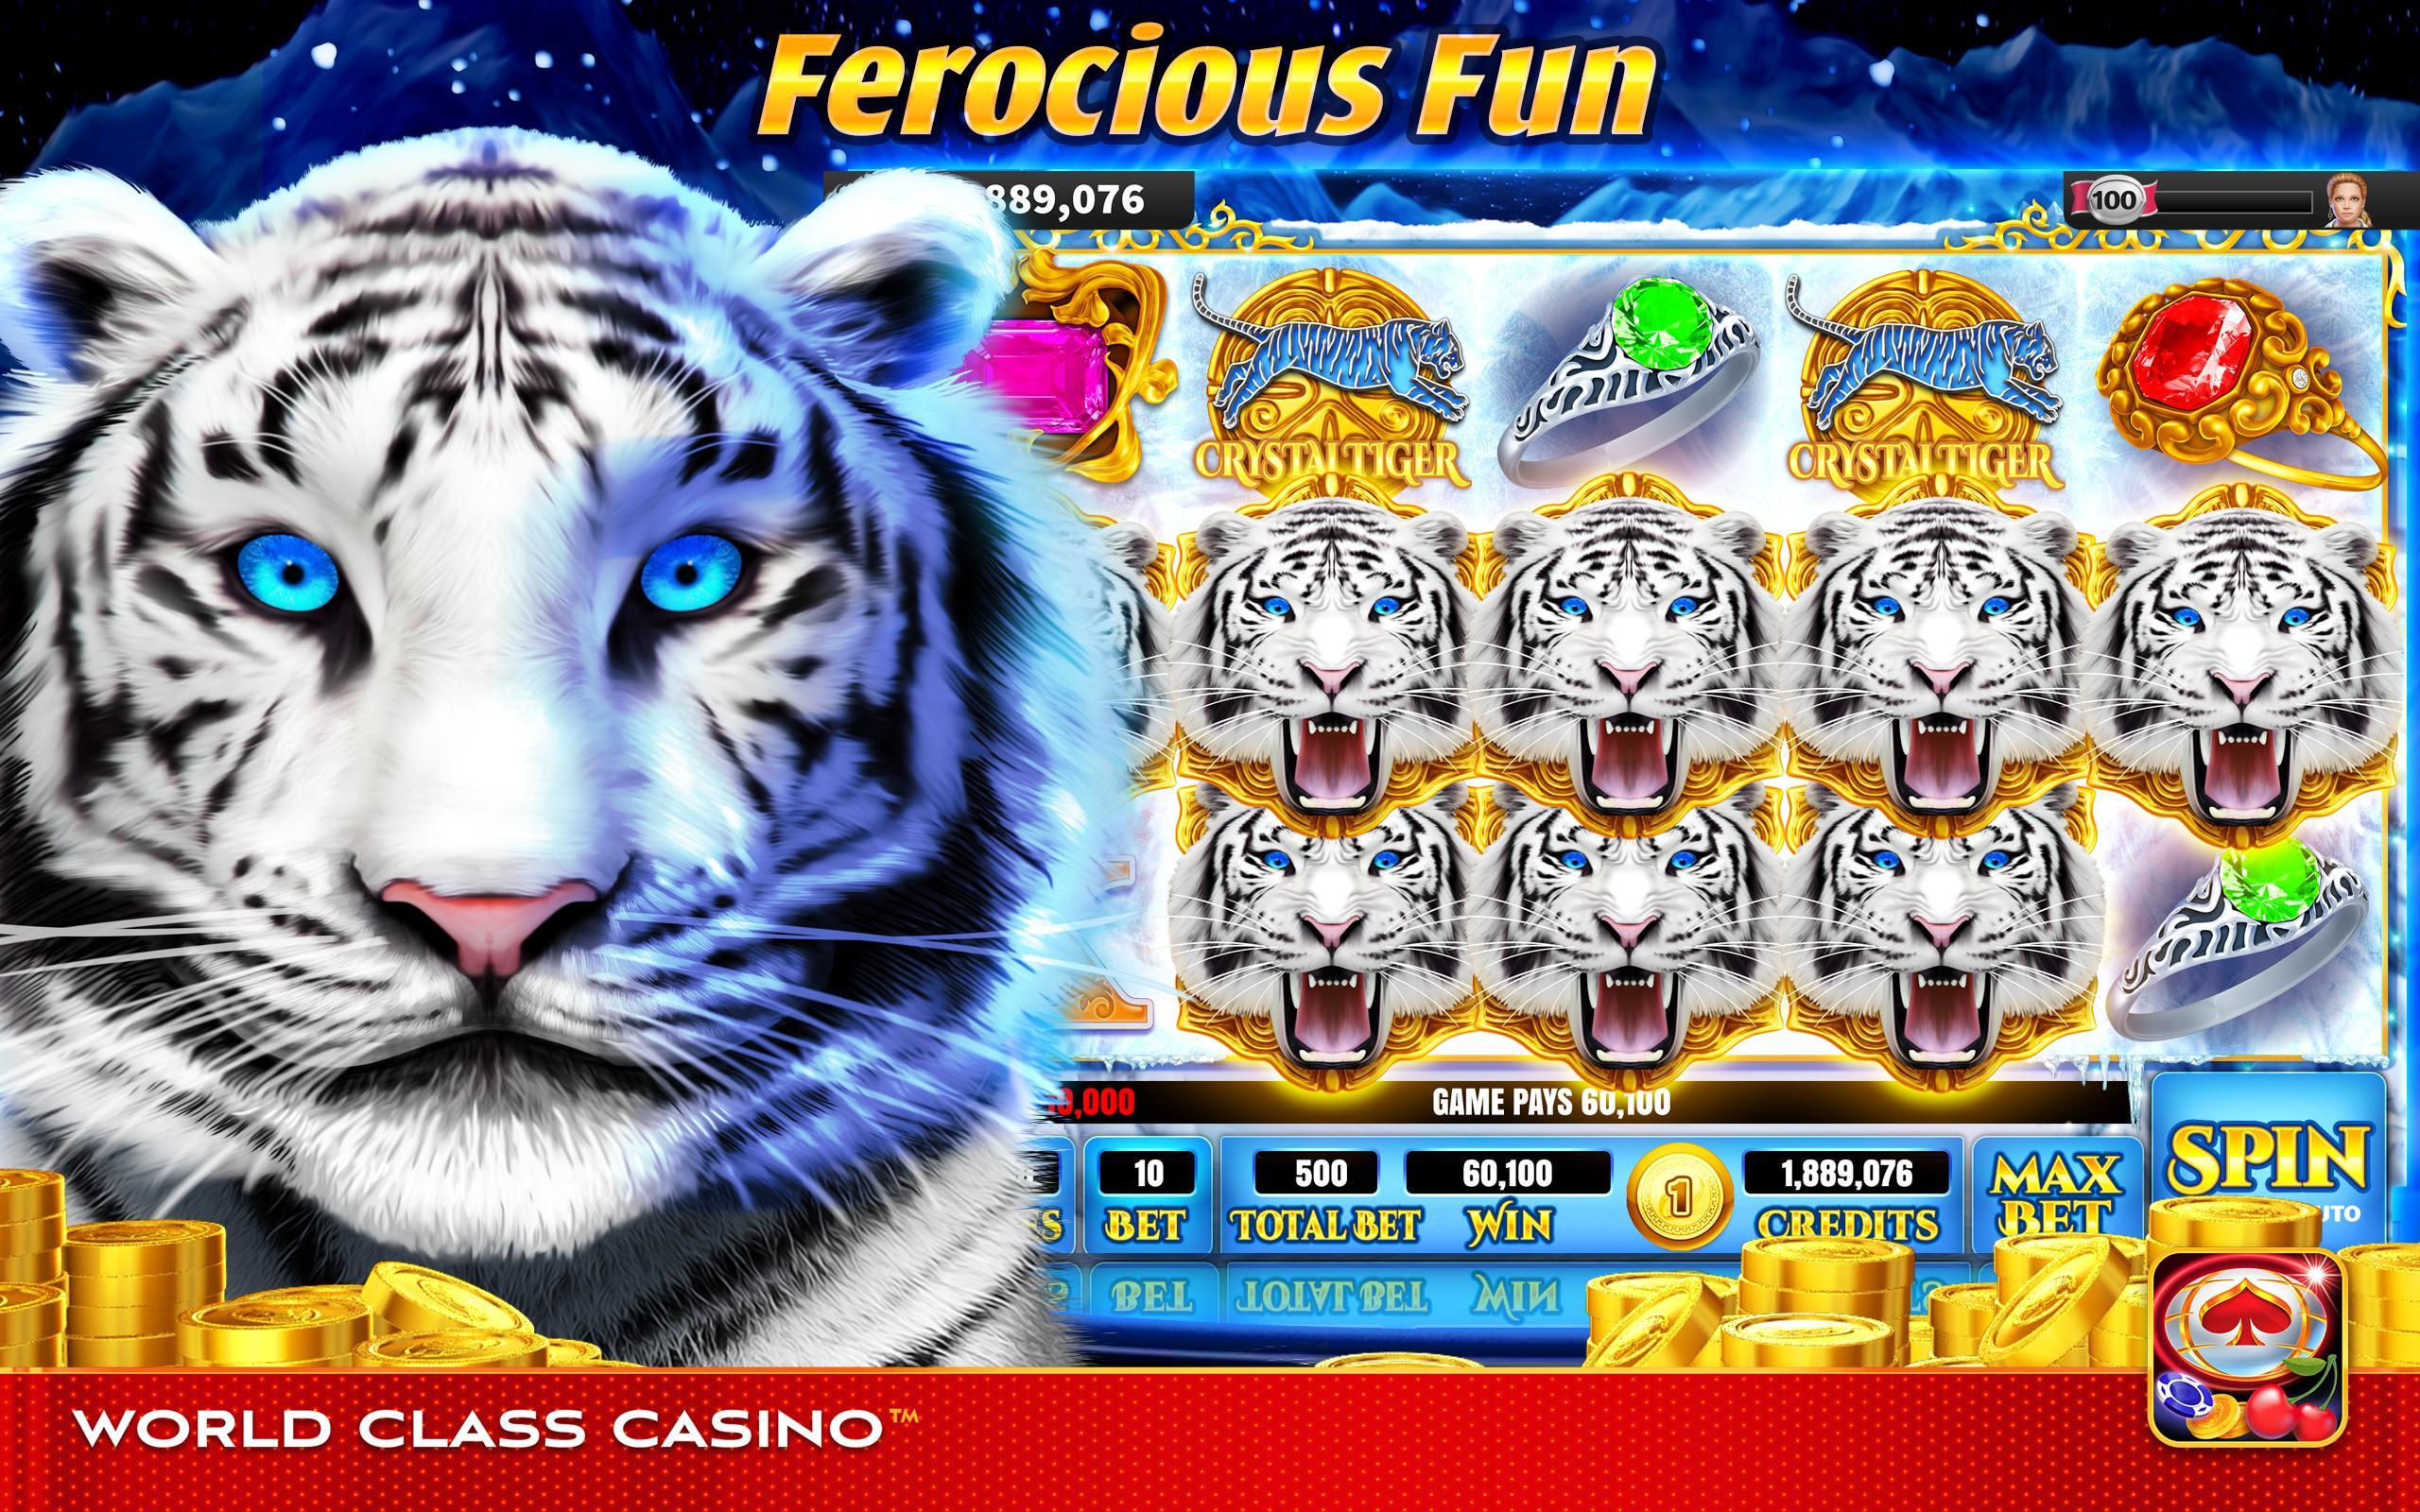 World Class Casino Slots, Blackjack & Poker Room 8.0.4 Screenshot 17